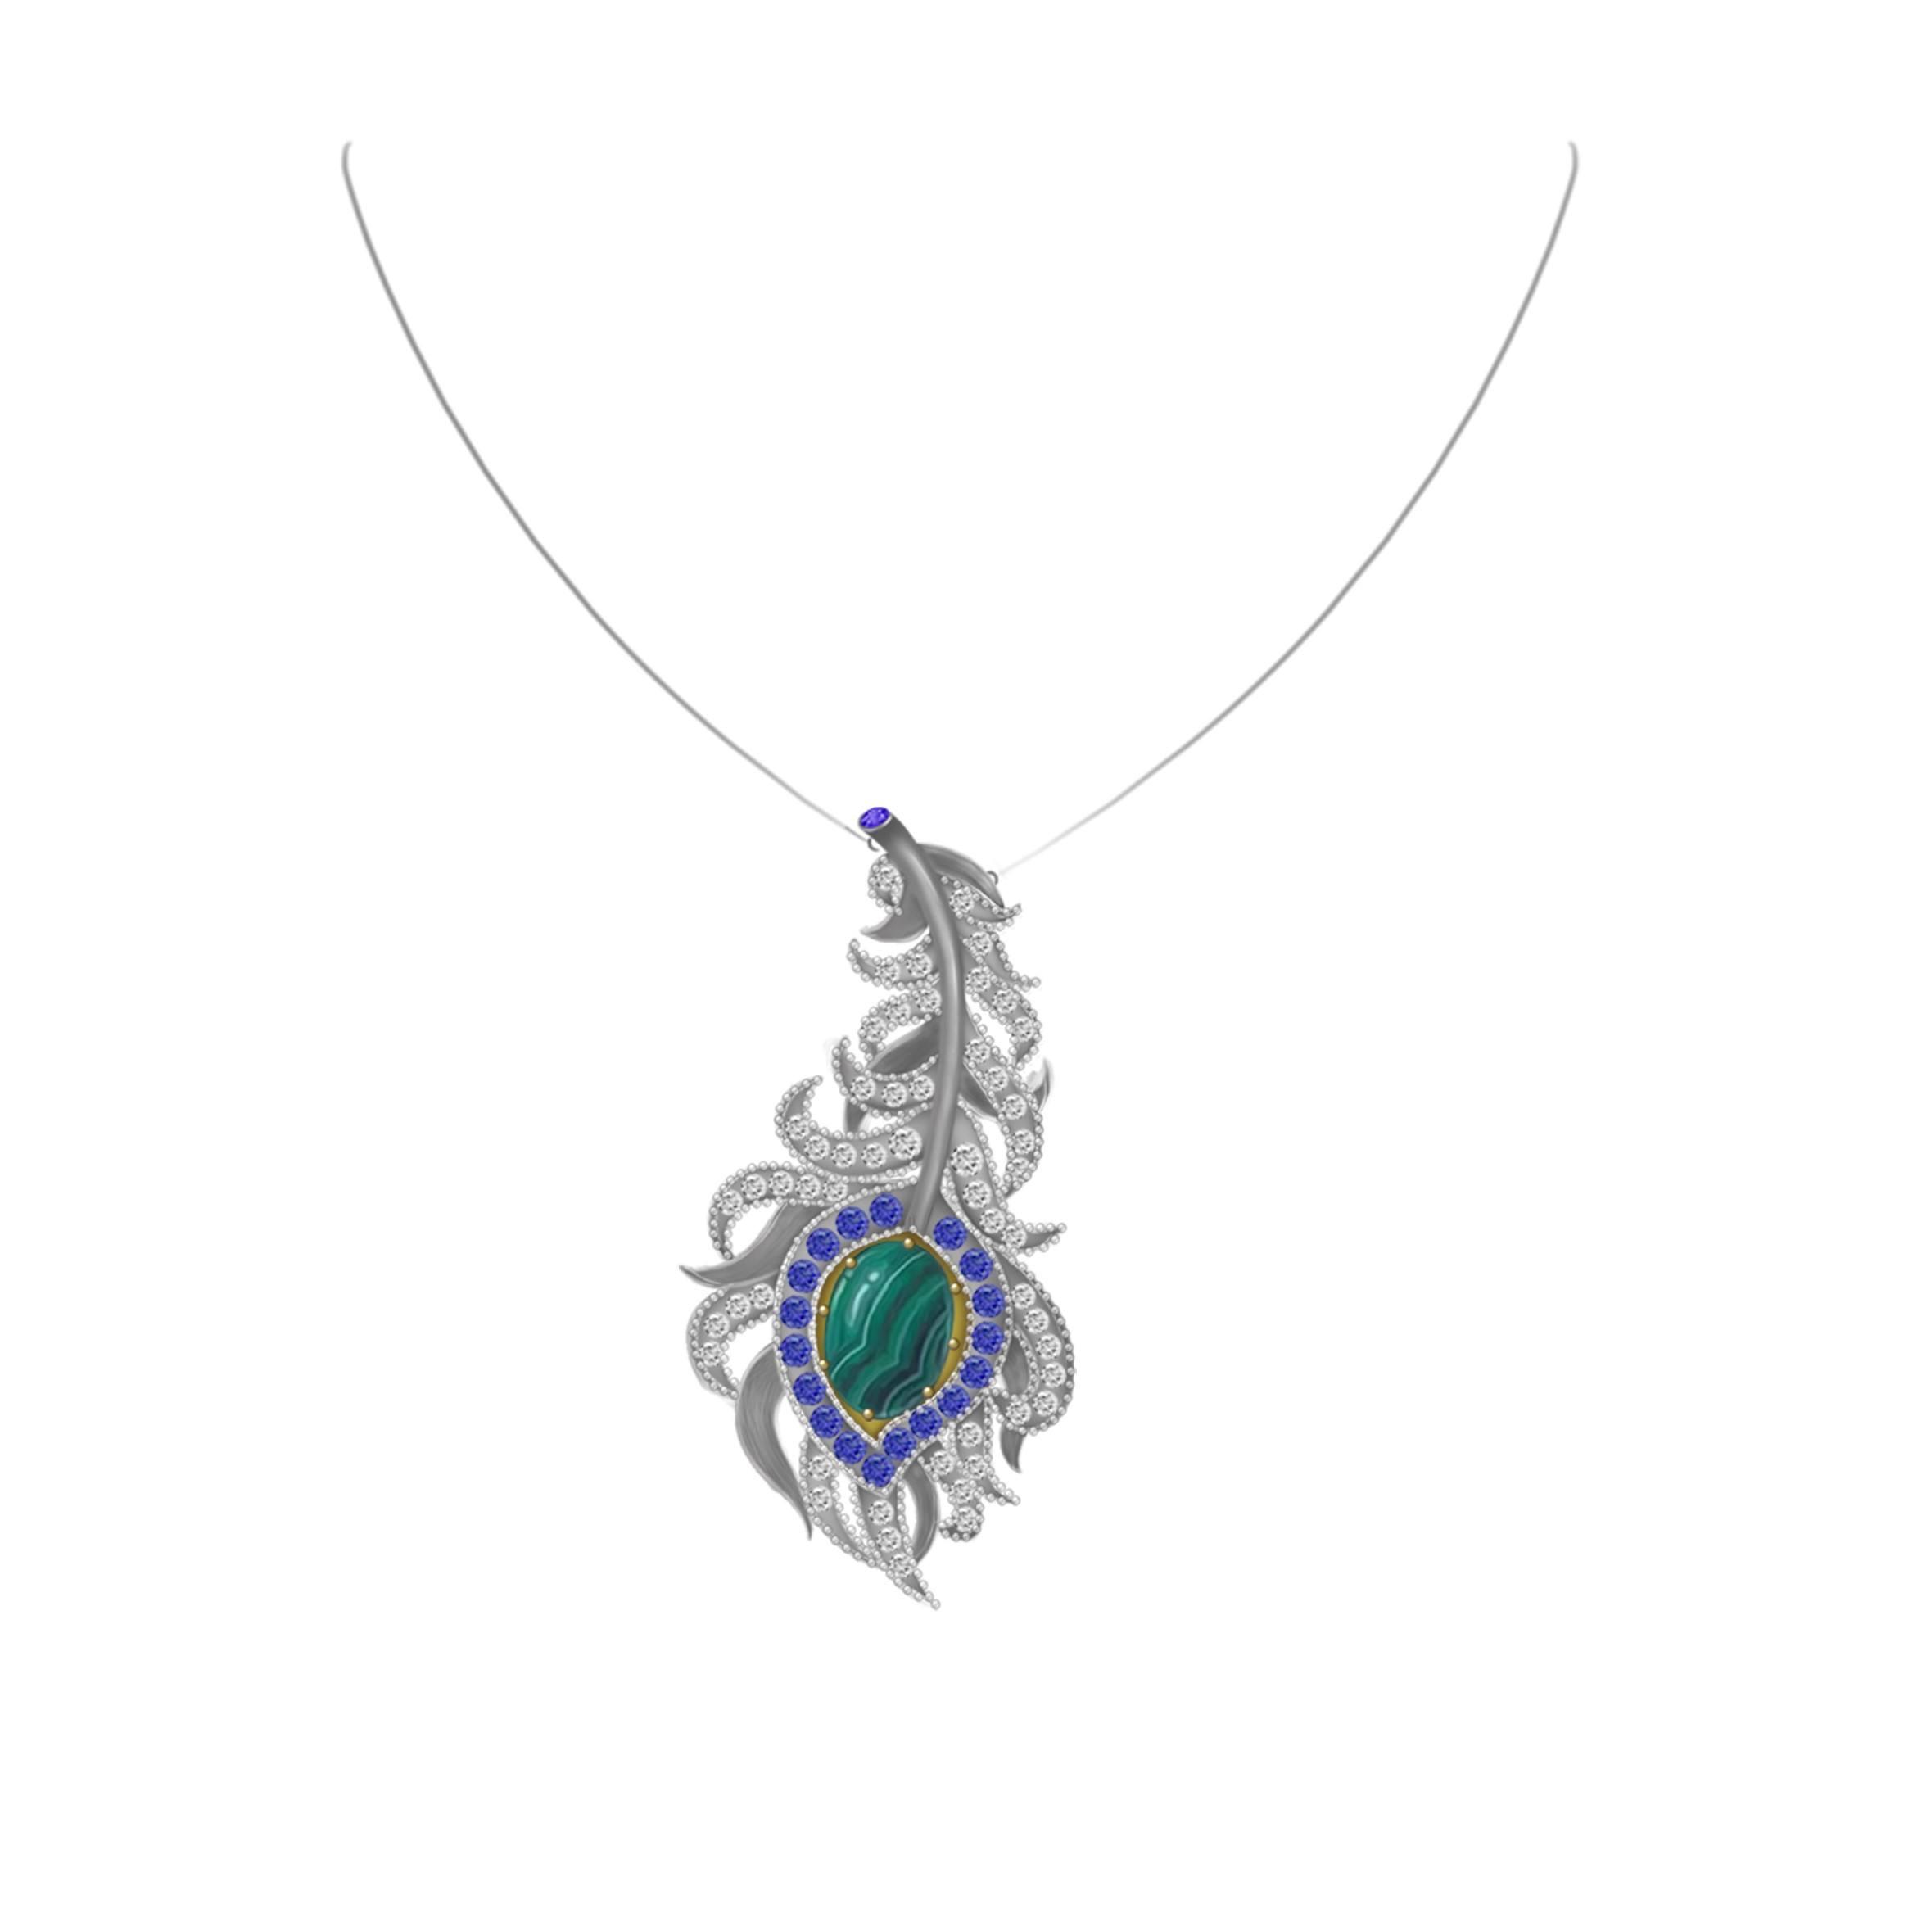 Gemstone Jewelry Jasper Gemstone Necklace Jasper Gemstones Pendant Jasper Gemstone and Silver Finished Brass Tree Of Life Pendant